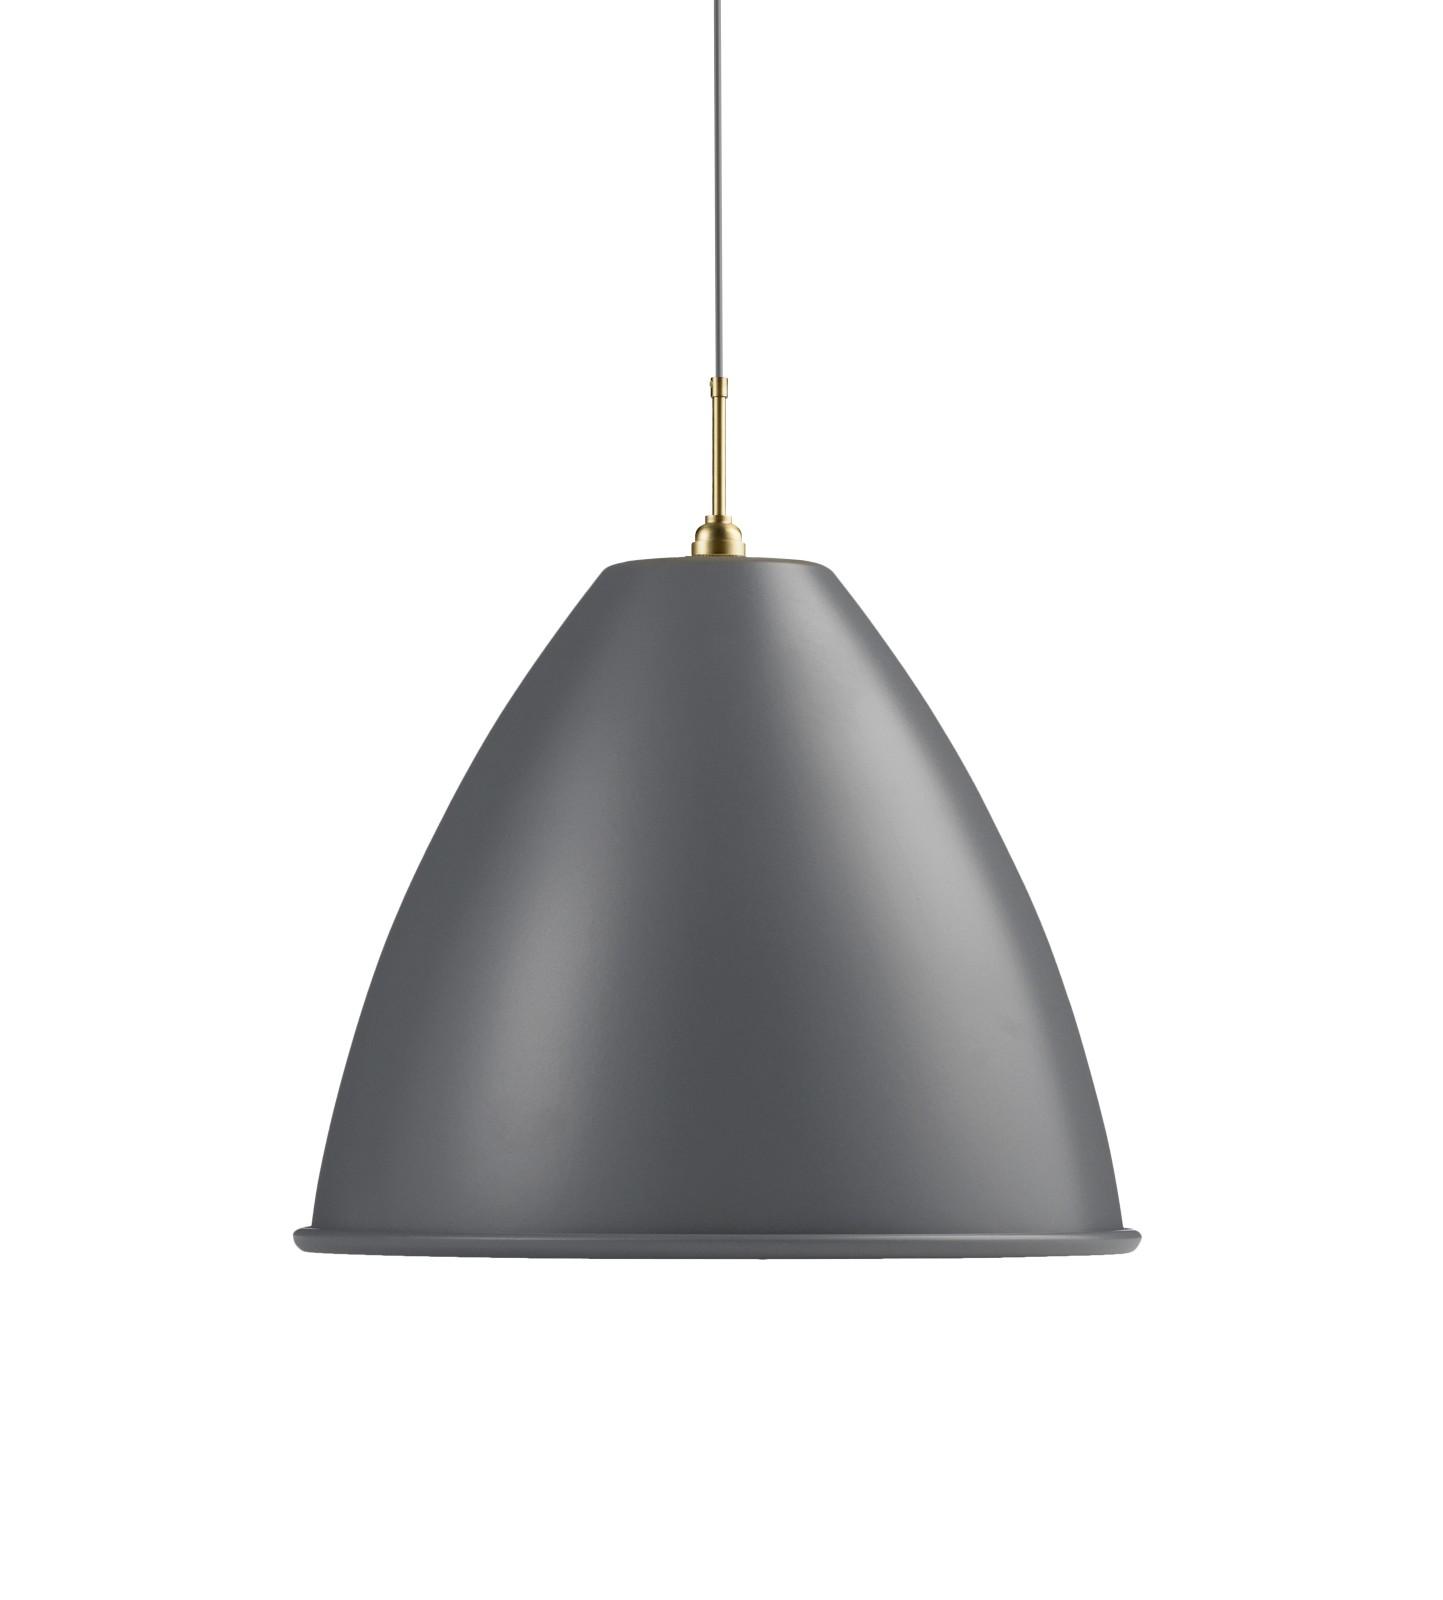 Bestlite BL9 Extra Large Pendant Lamp Grey/Brass